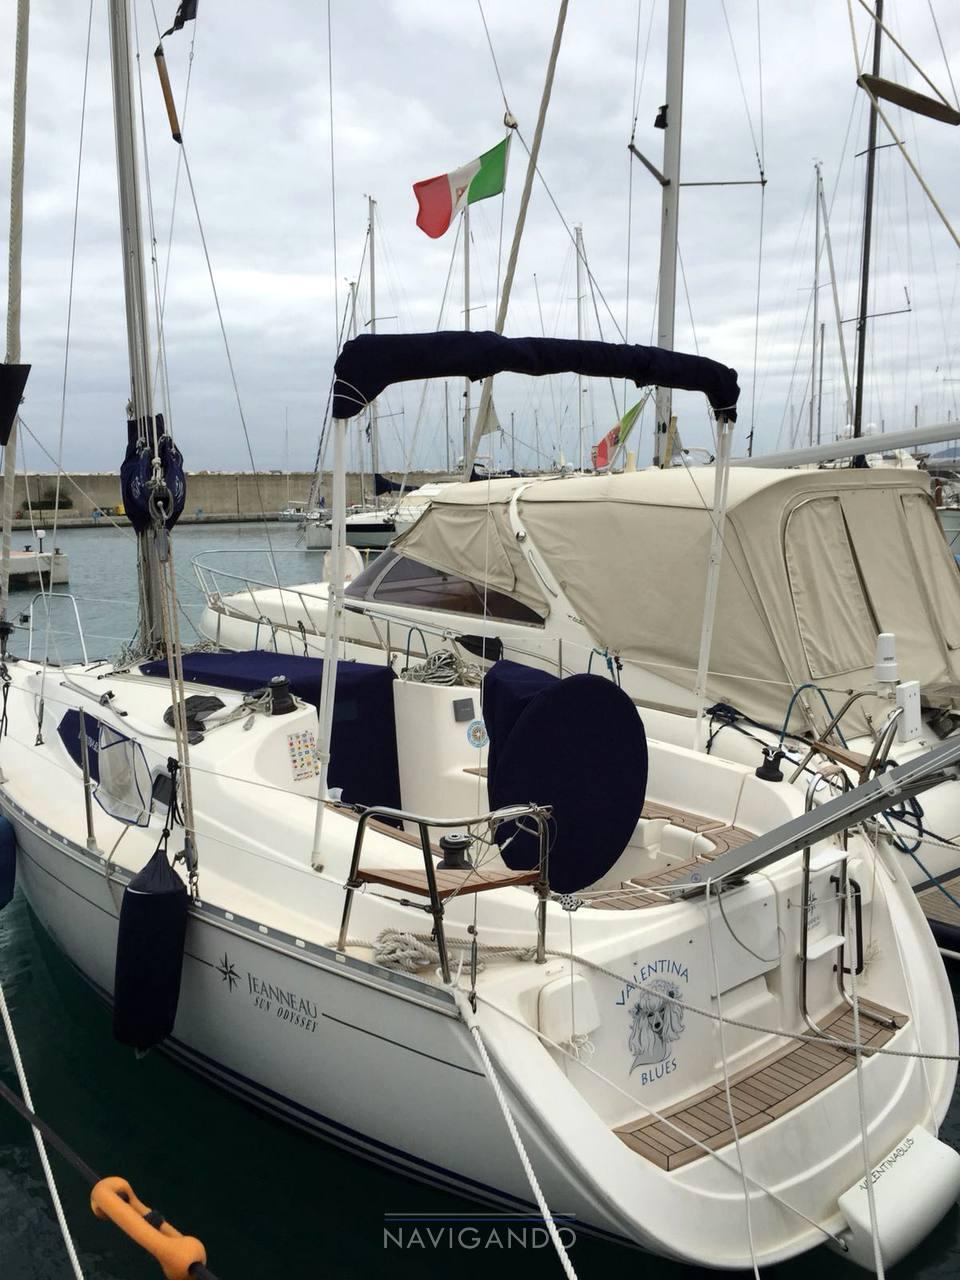 Jeanneau Sun odyssey 29 Sailing boat used for sale